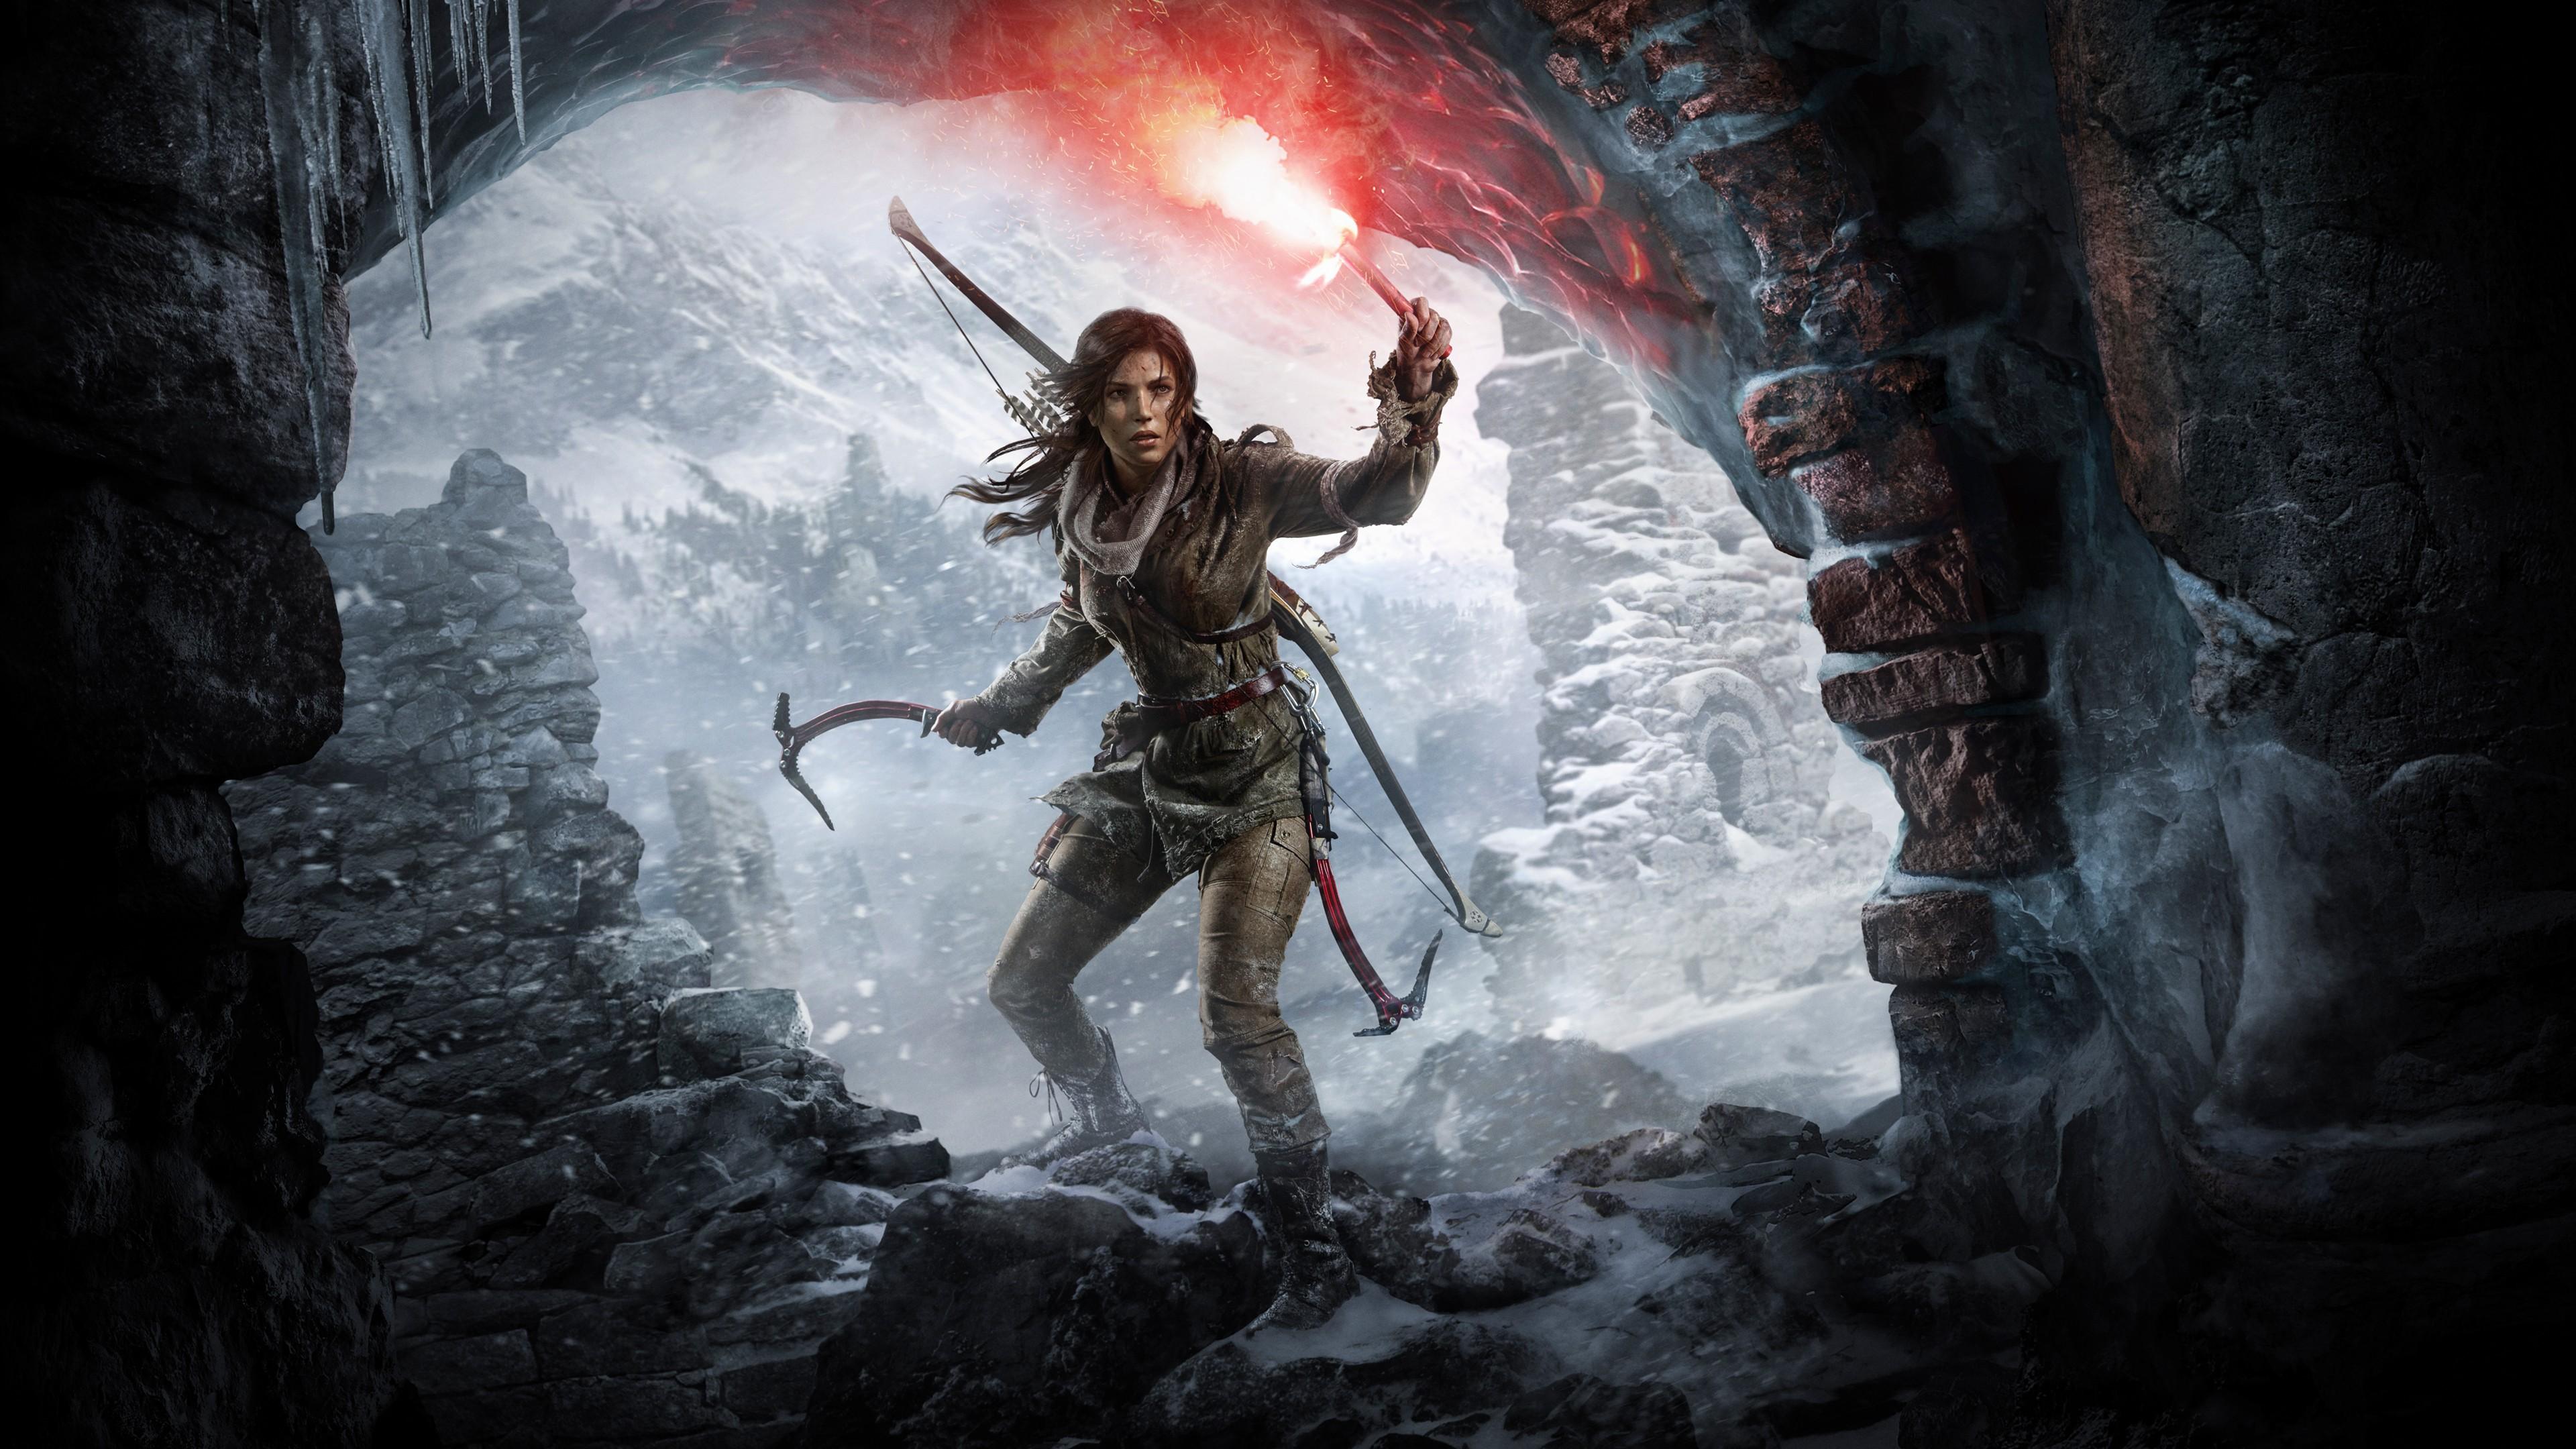 Tomb Raider Pictures